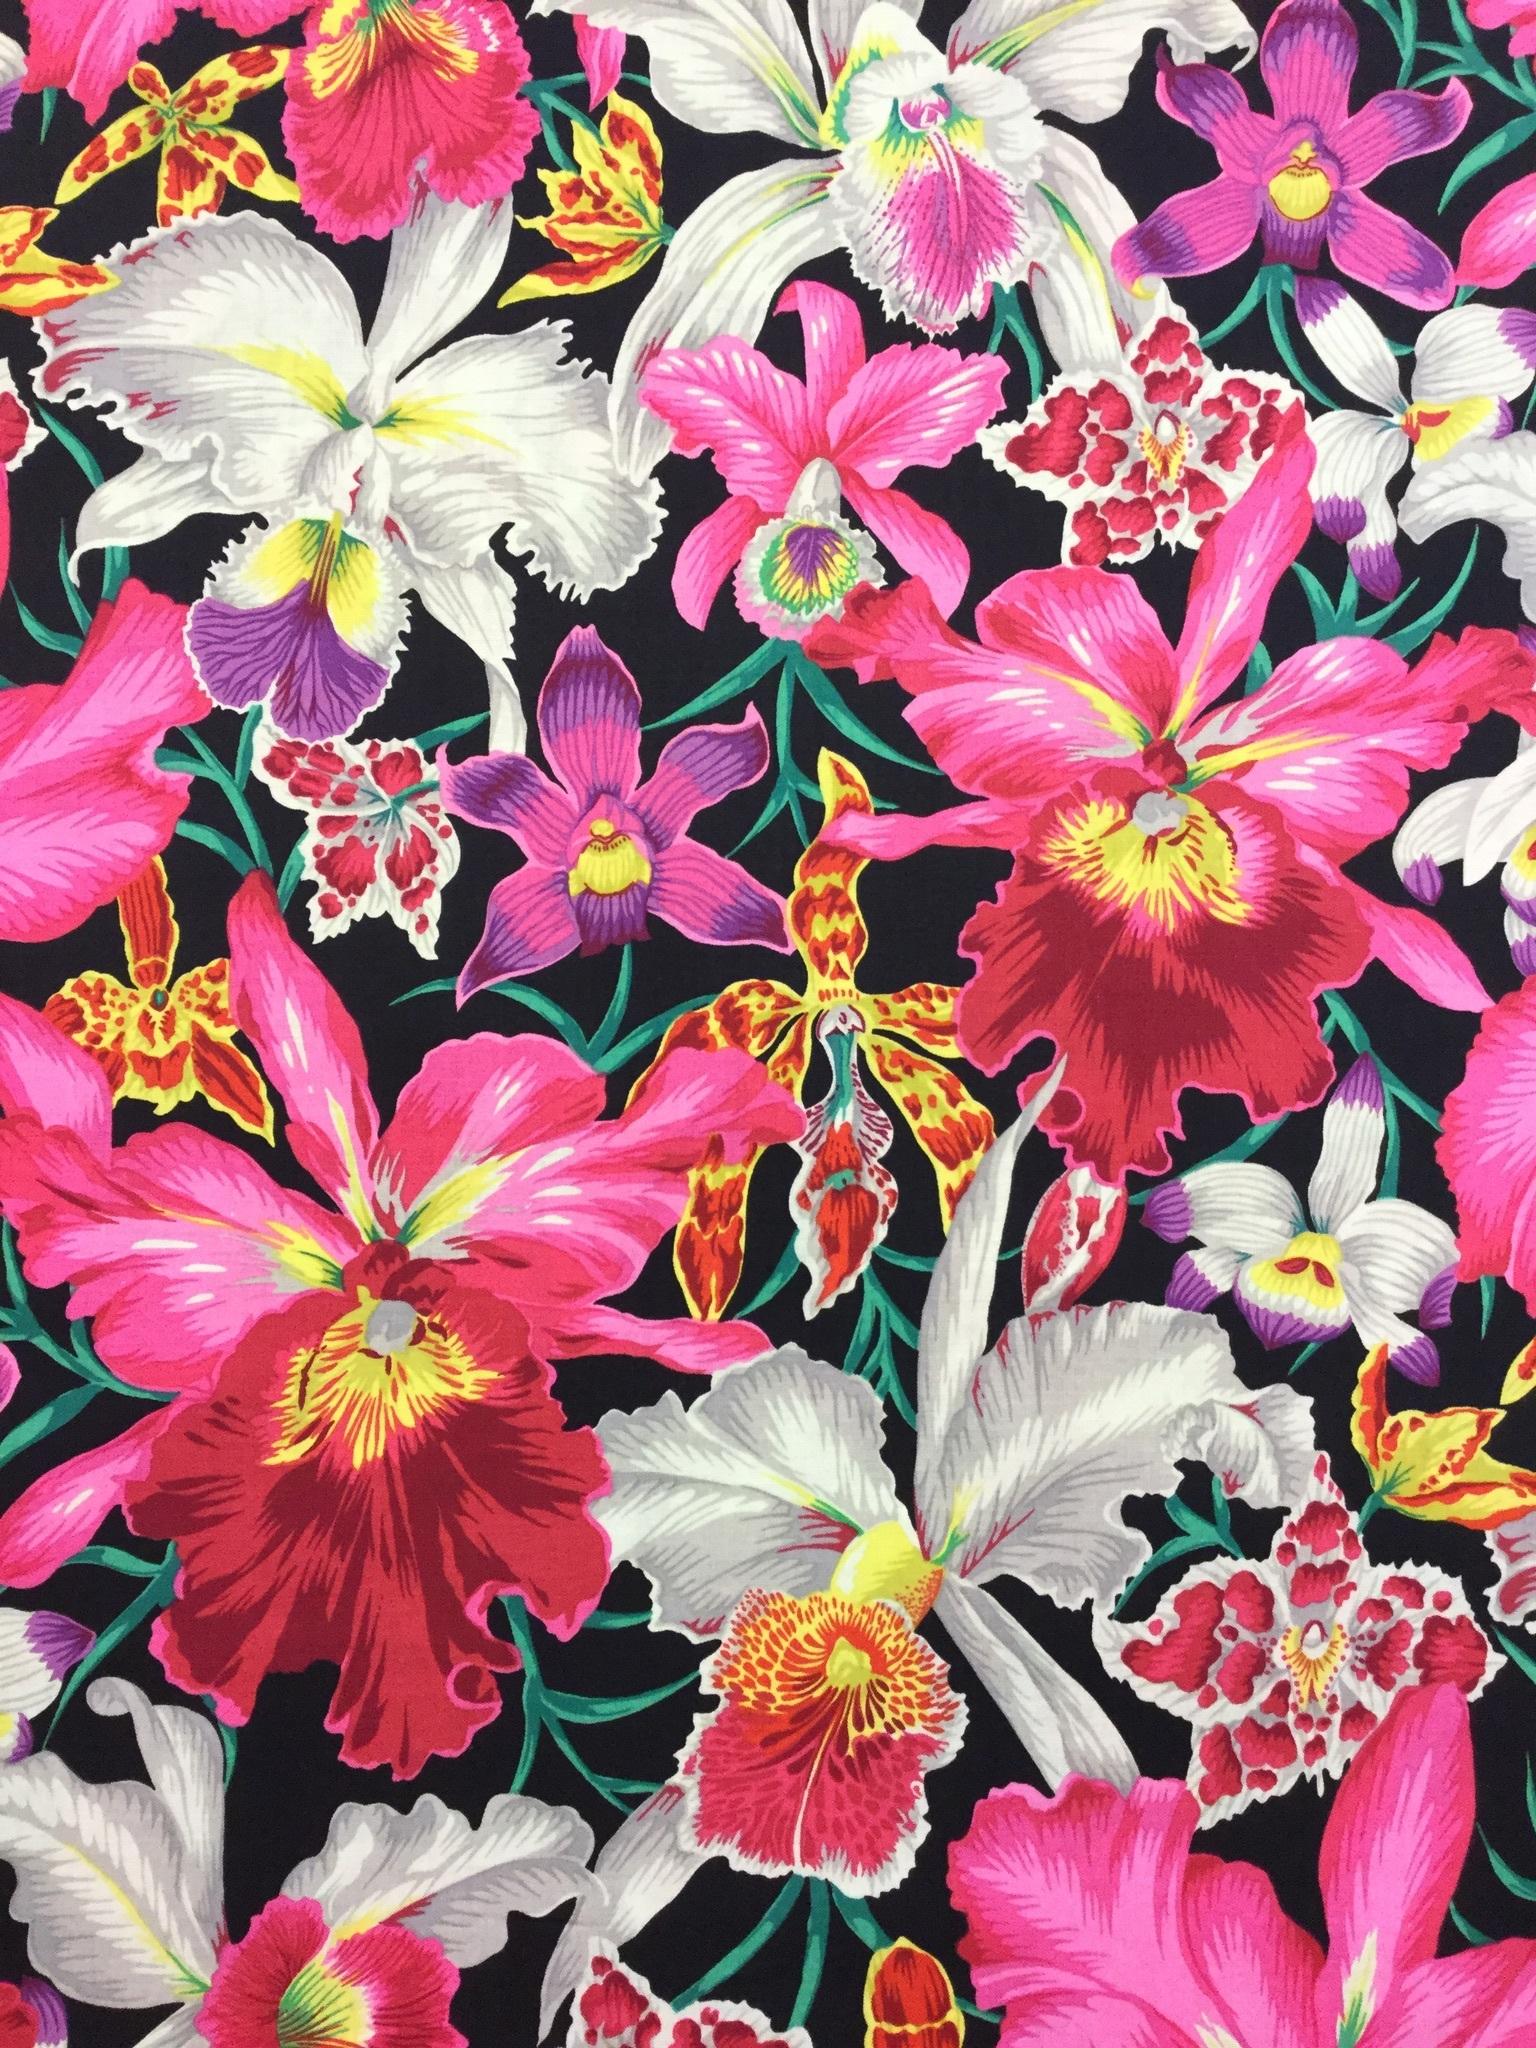 tigerlilja svart rosa blommor bomull metervara modetyg Tyglust